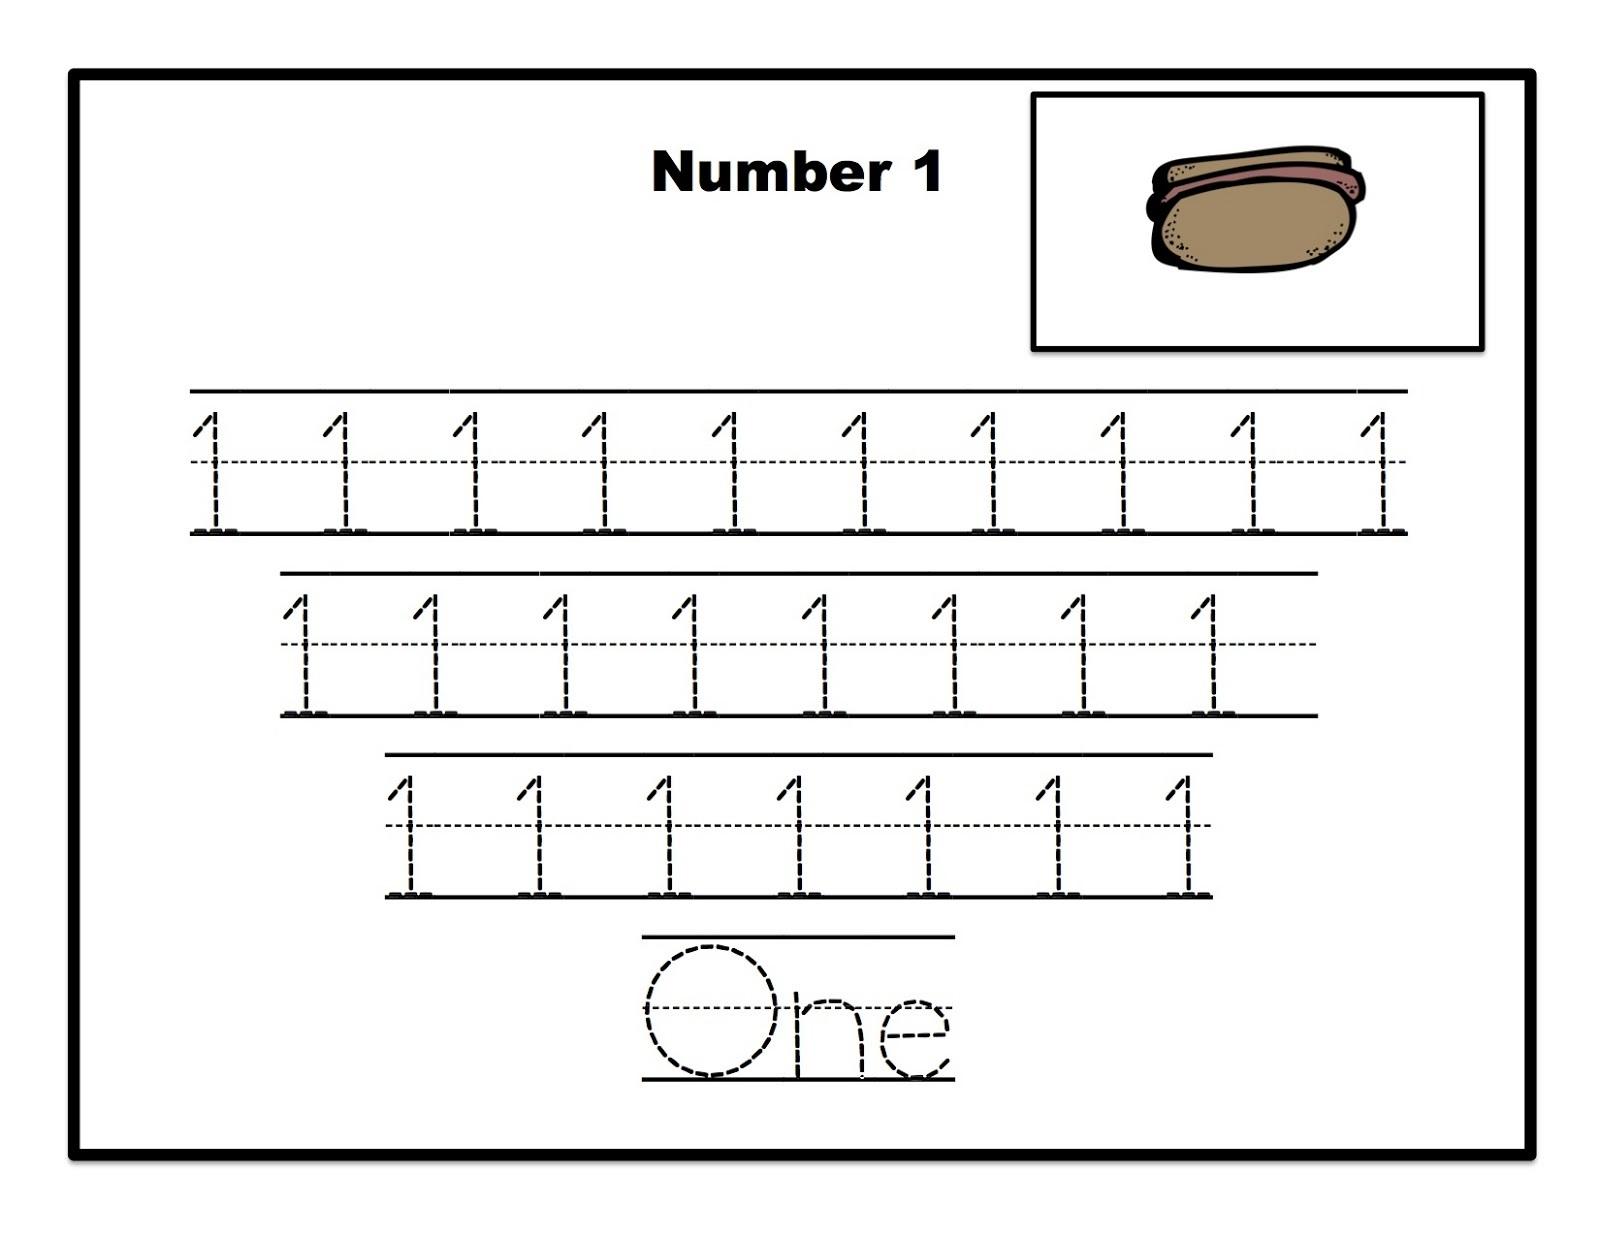 number 1 tracing worksheets for preschool easy